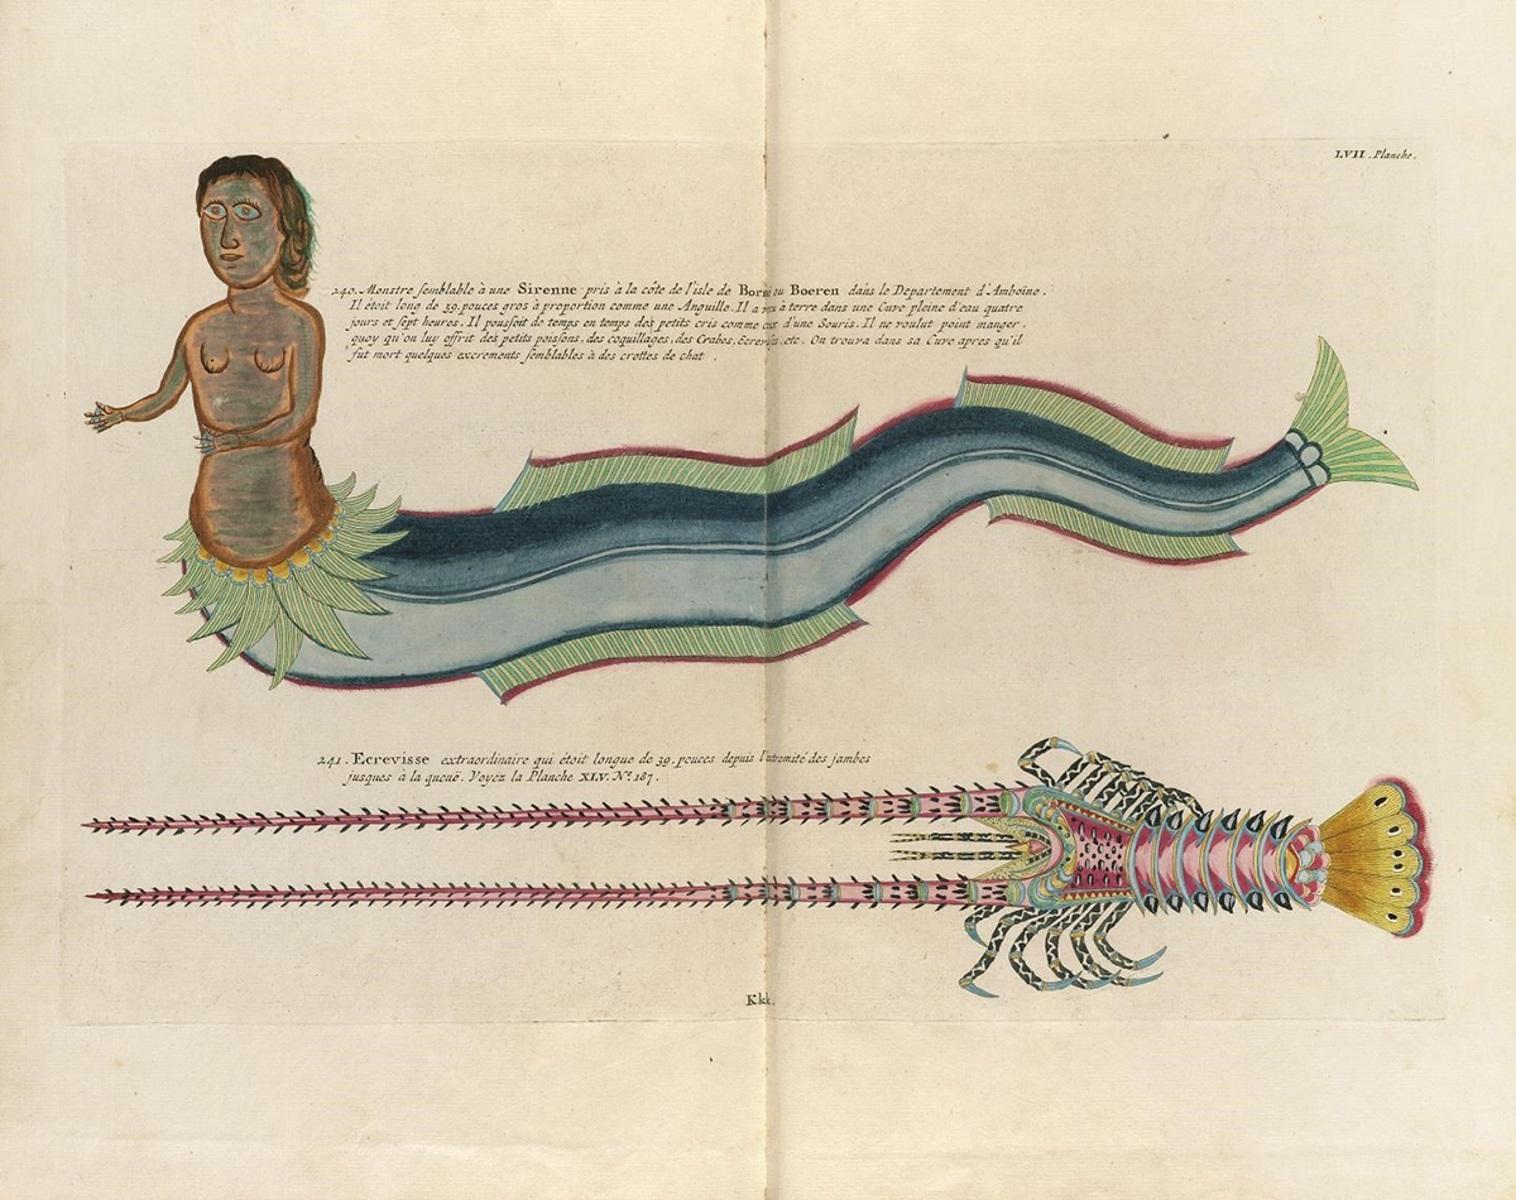 Online οι πρώτες έγχρωμες φωτογραφίες θαλάσσιας ζωής από τον 18ο αιώνας